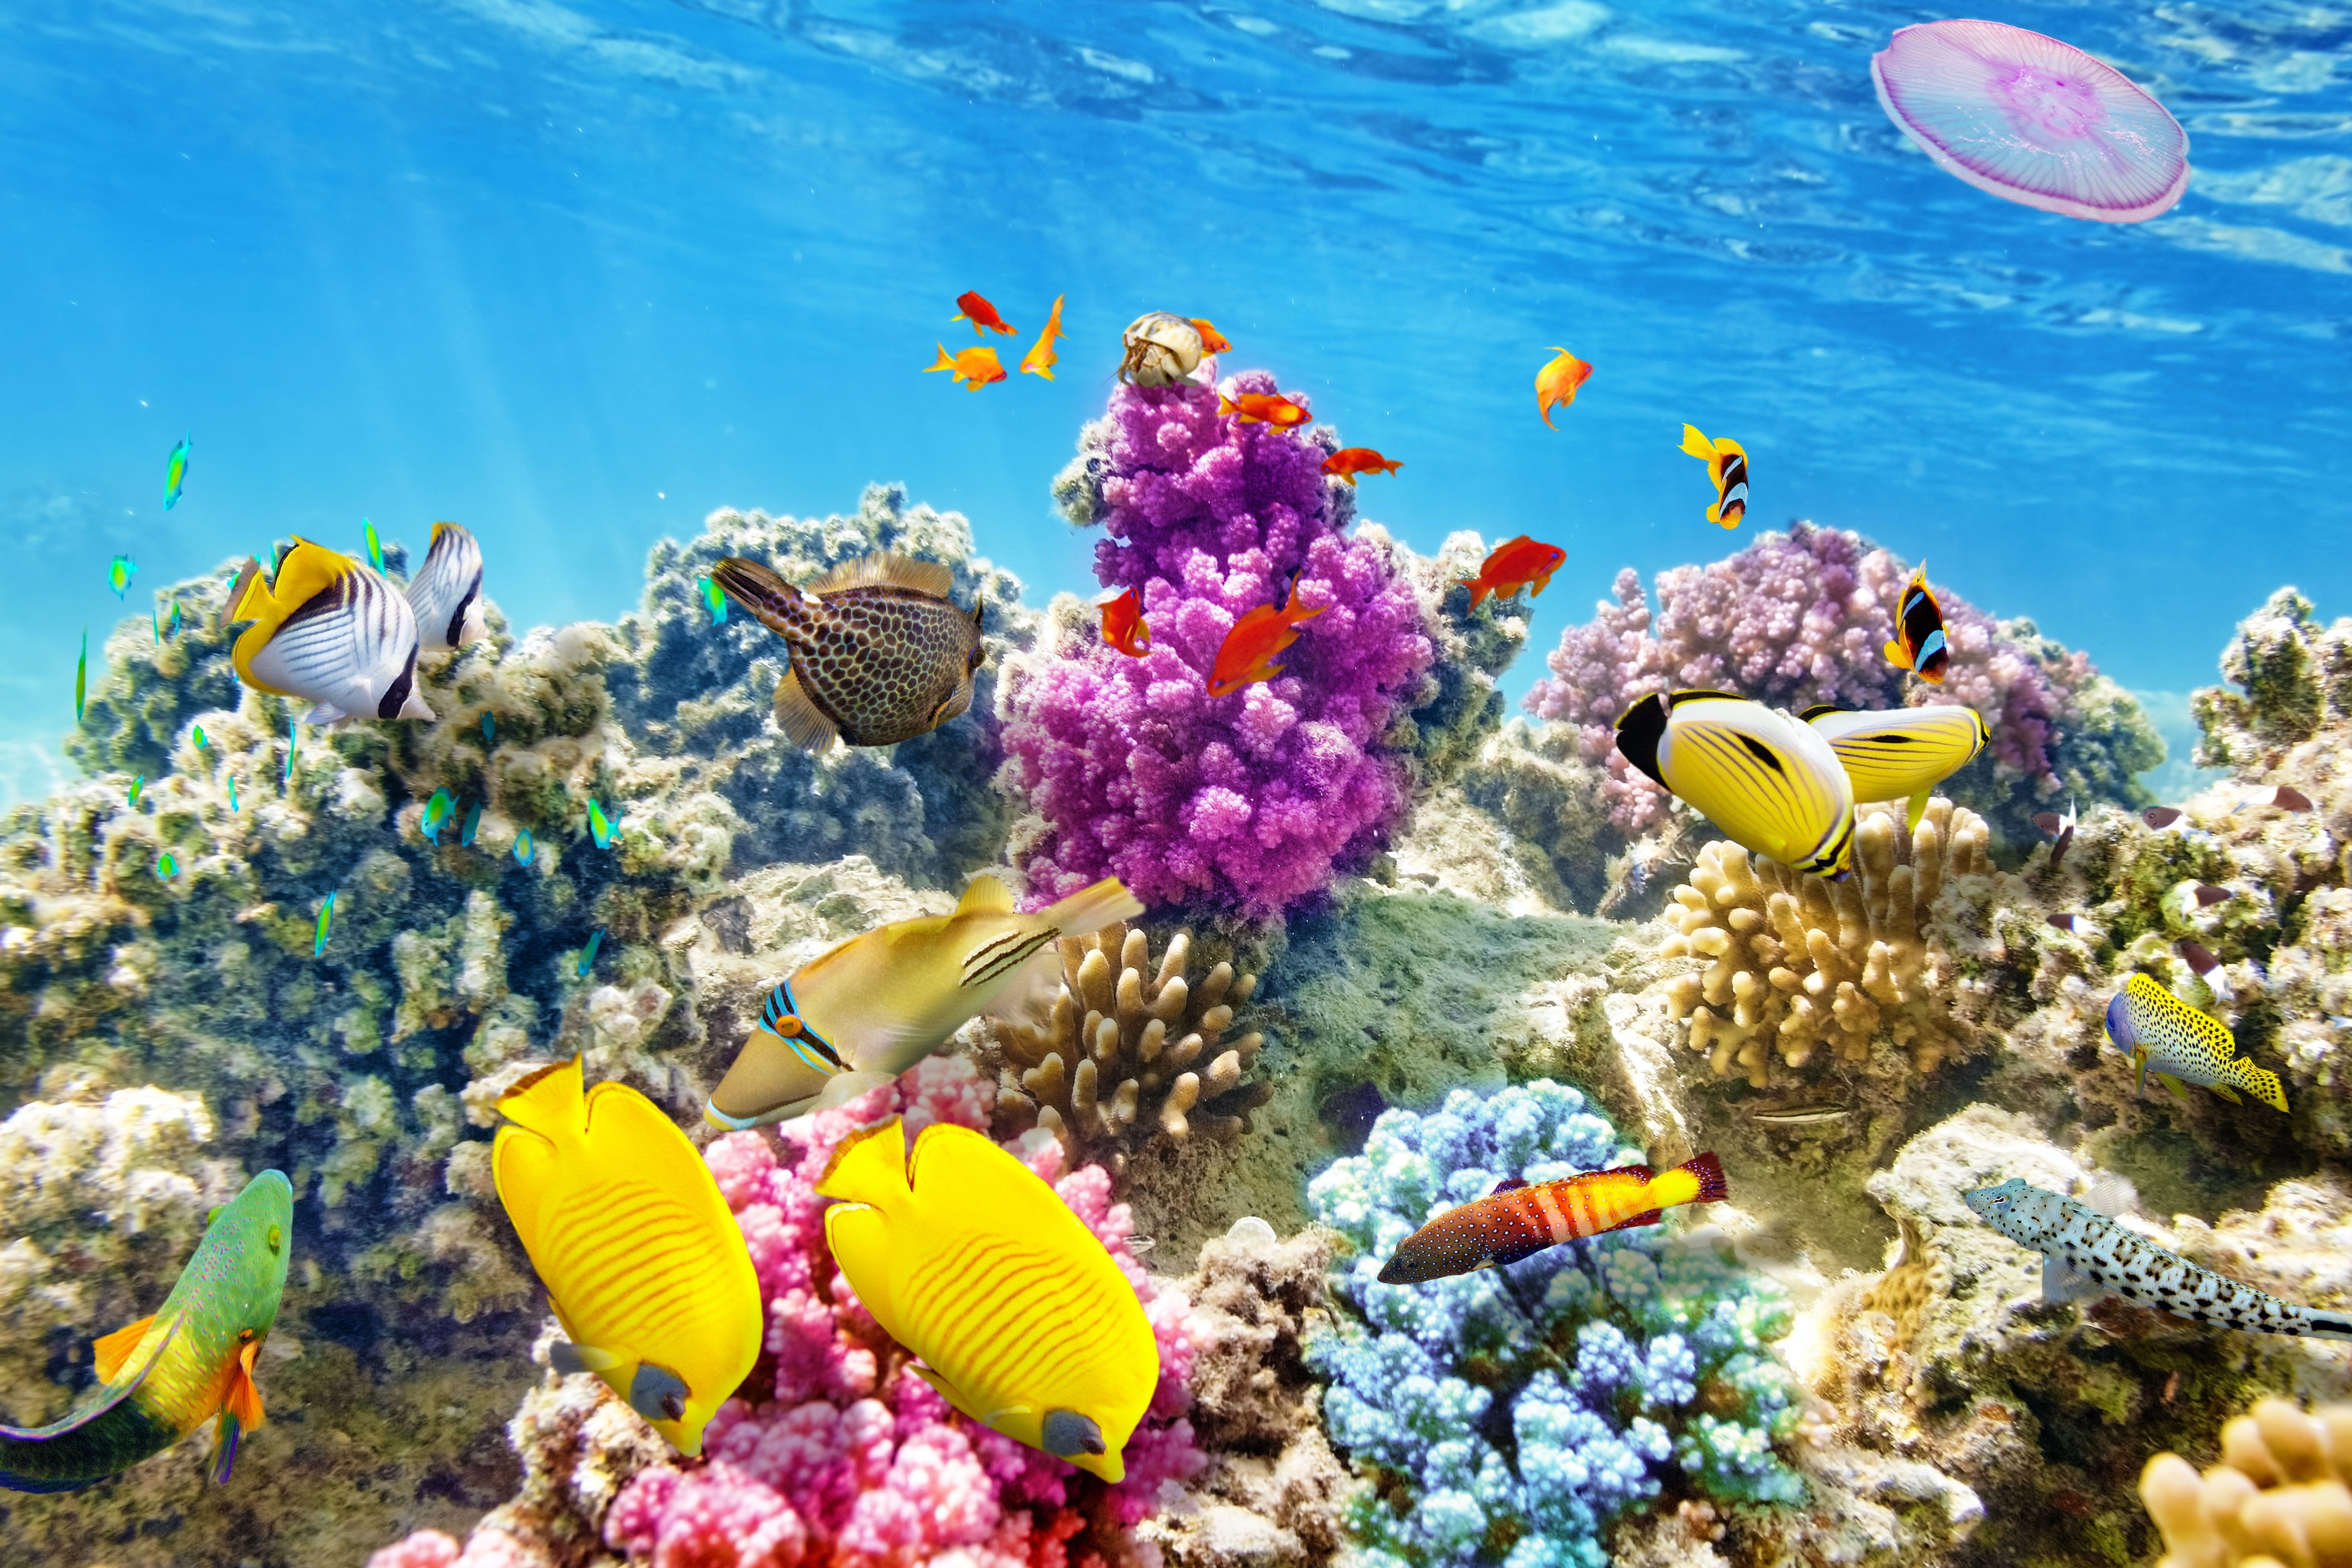 Fish The Ocean World Underwater World Underwater Ocean Fishes Tropical Reef Coral Coral Reef 5k Wallpape Ocean Underwater Tropical Fish Ocean Fishing